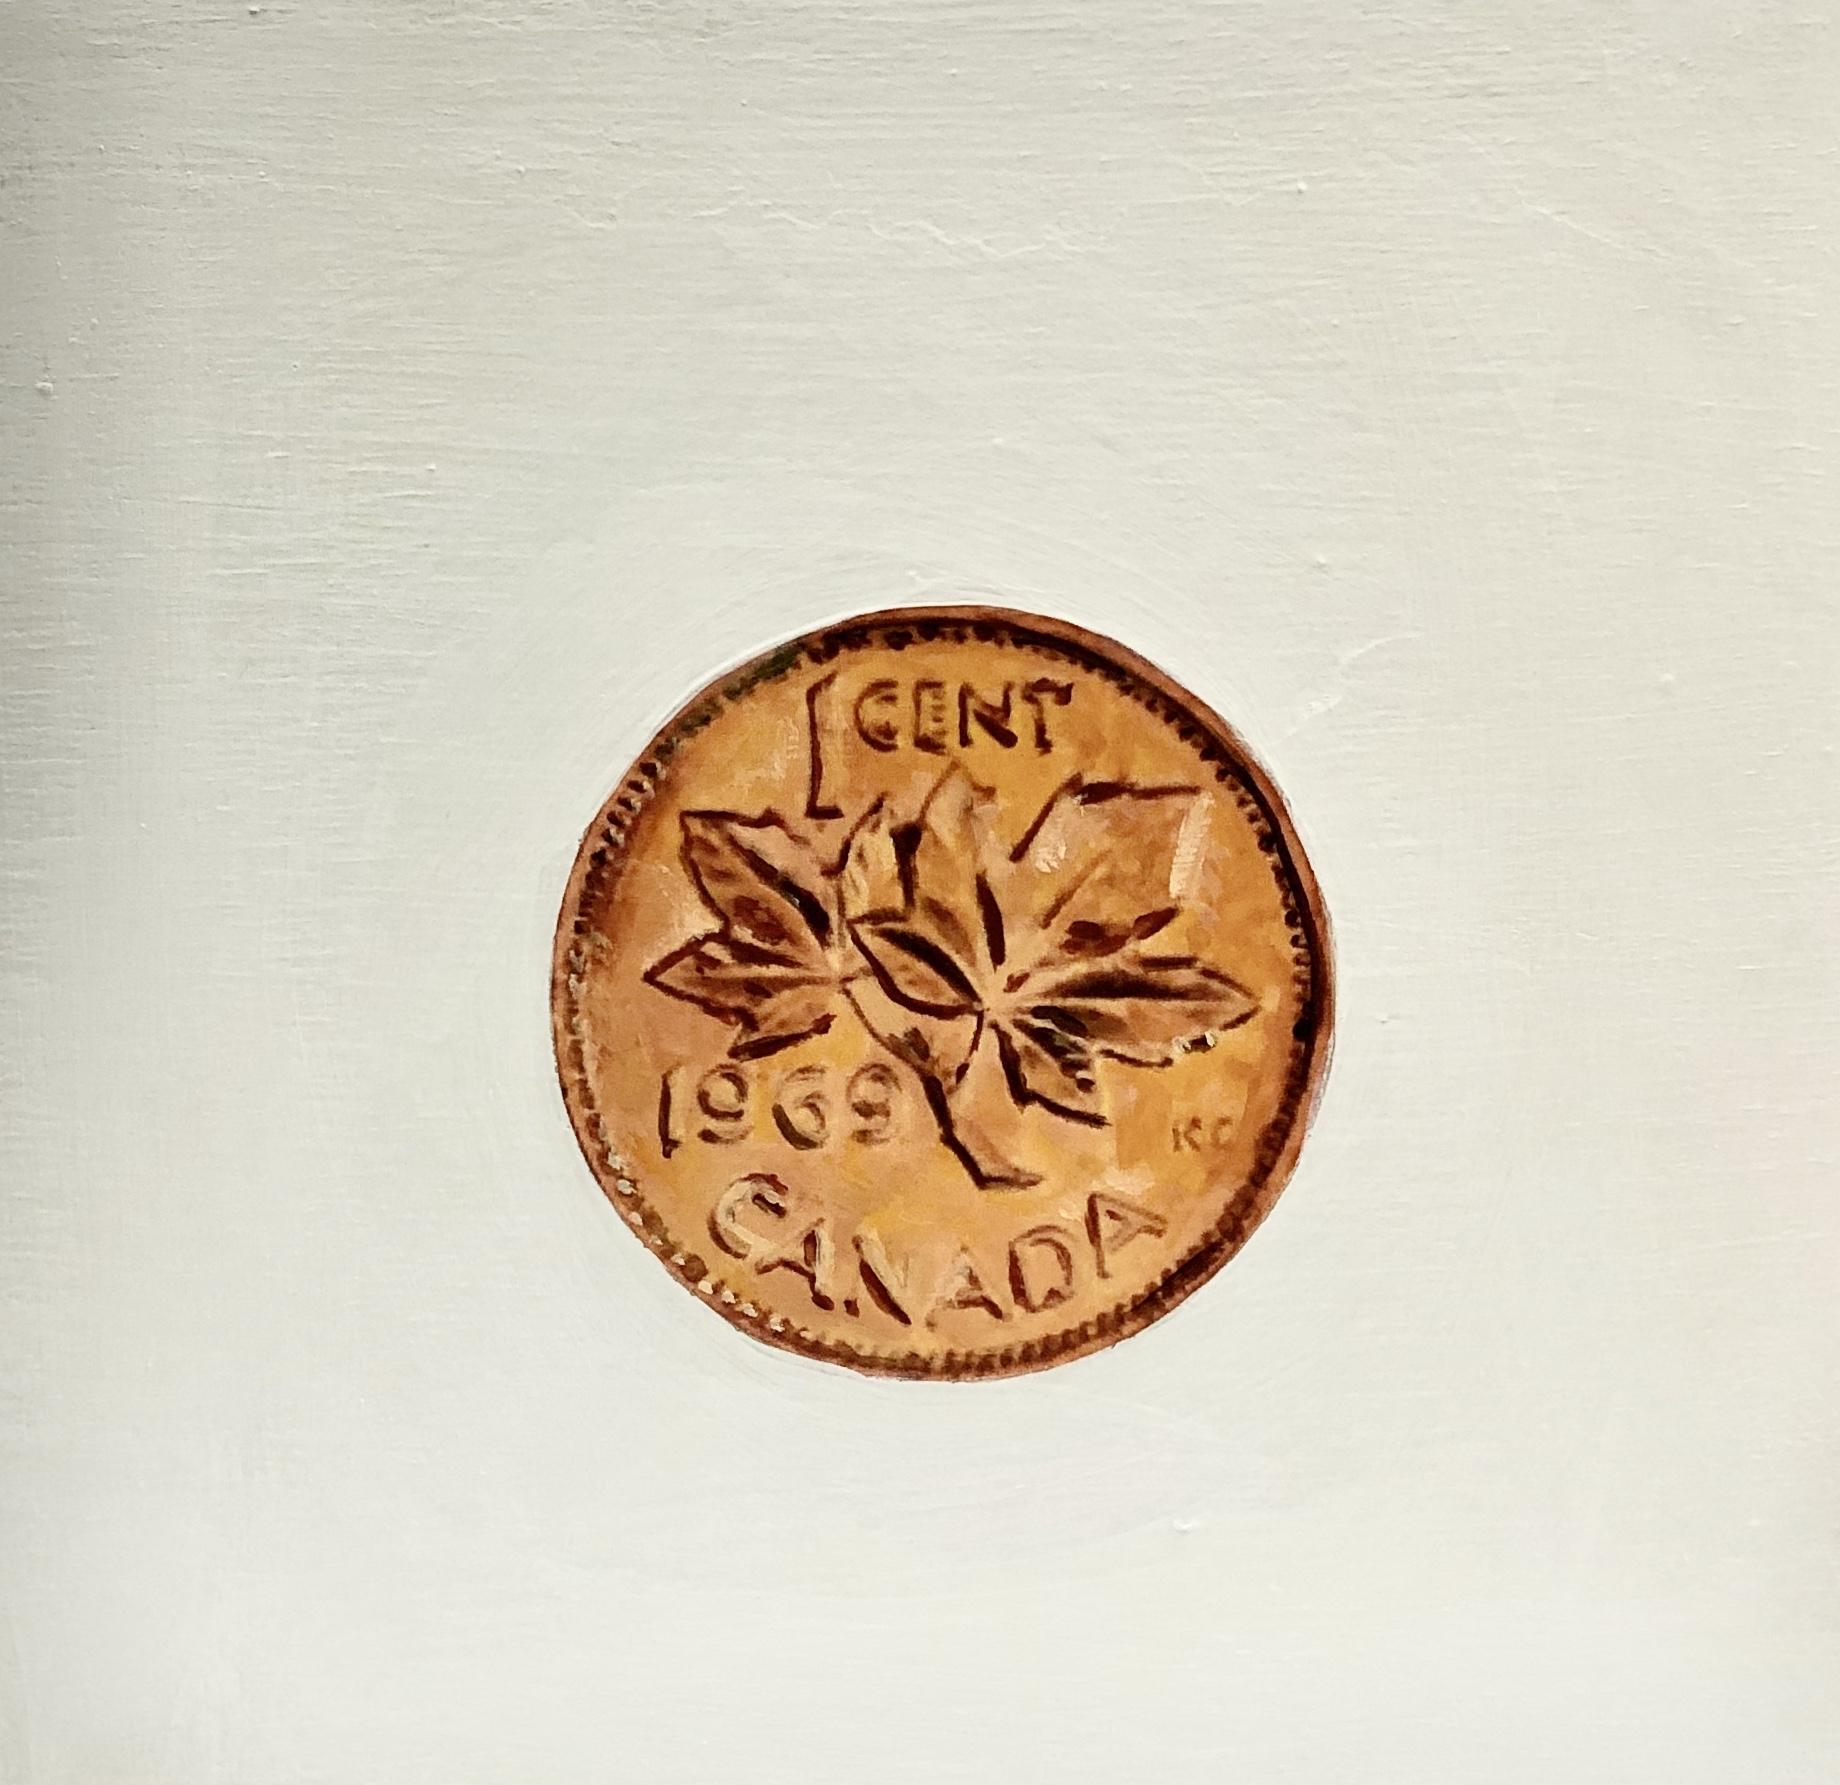 Penny 1969  by EM Vincent